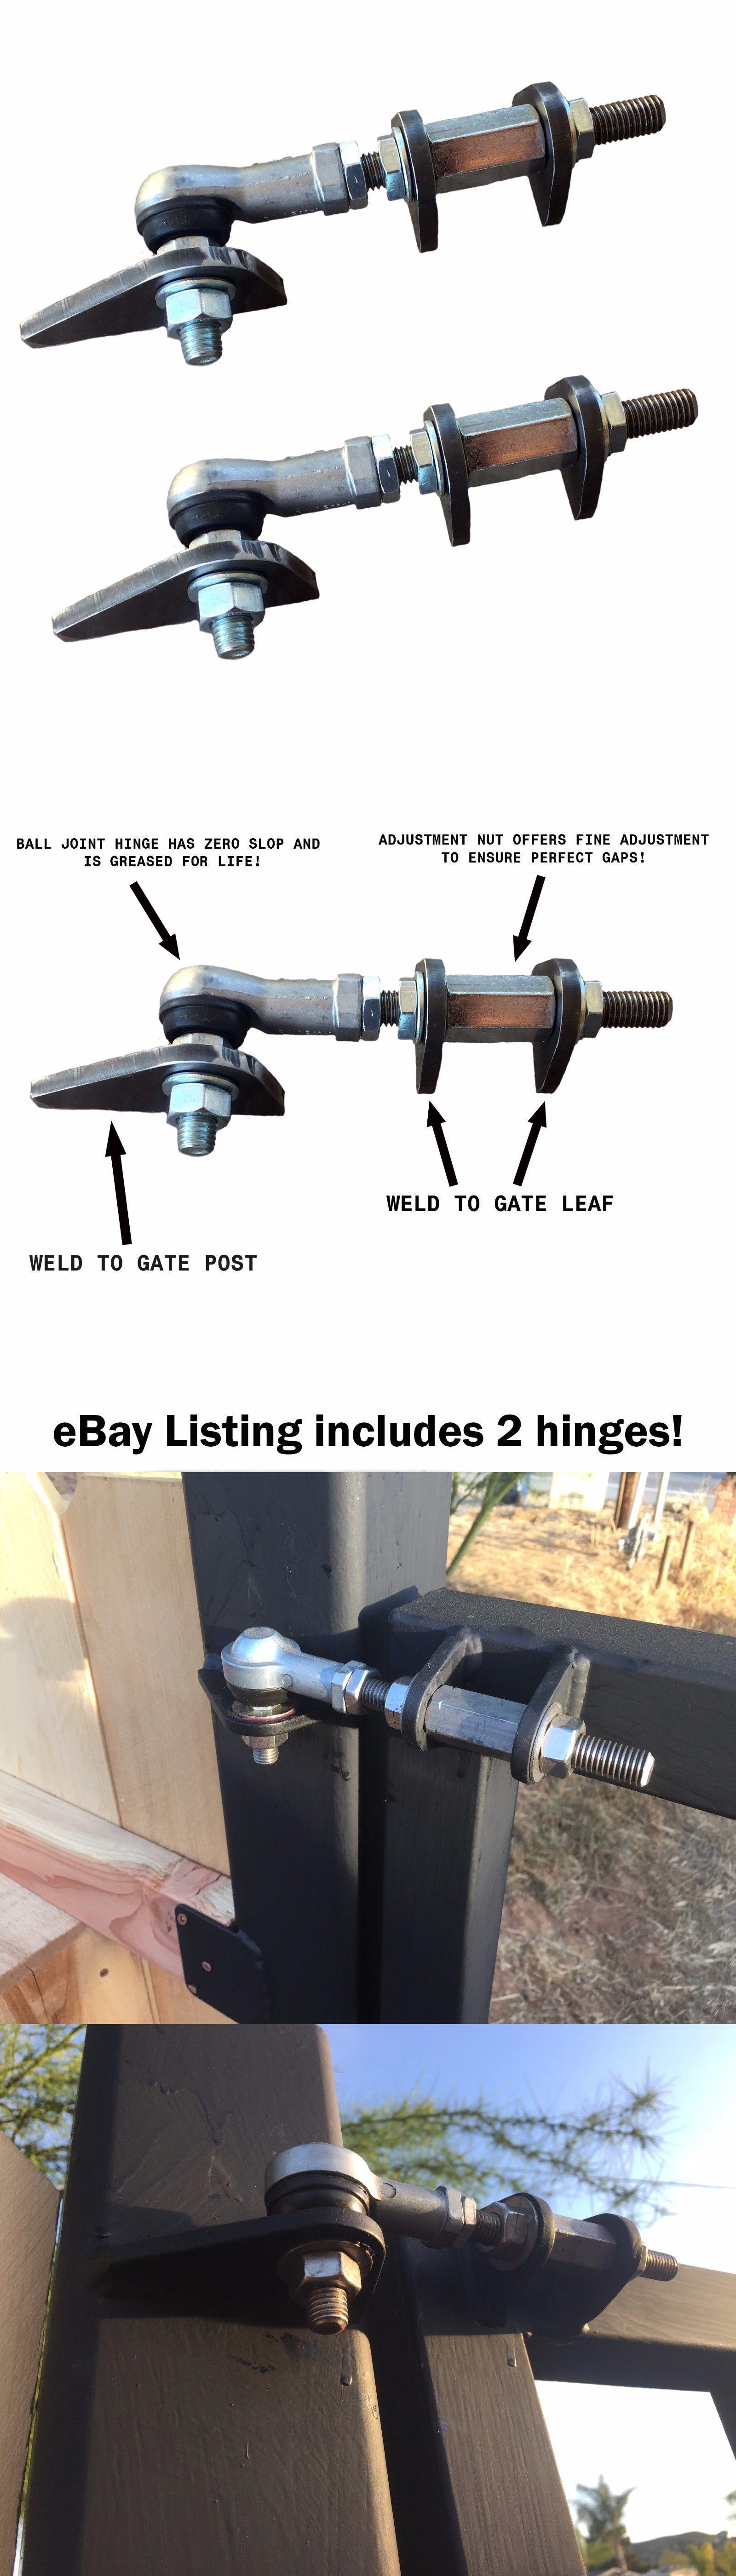 Door Hinges 66739: Heavy Duty Adjustable Gate Hinges W Sealed Ball Joints   U003e BUY